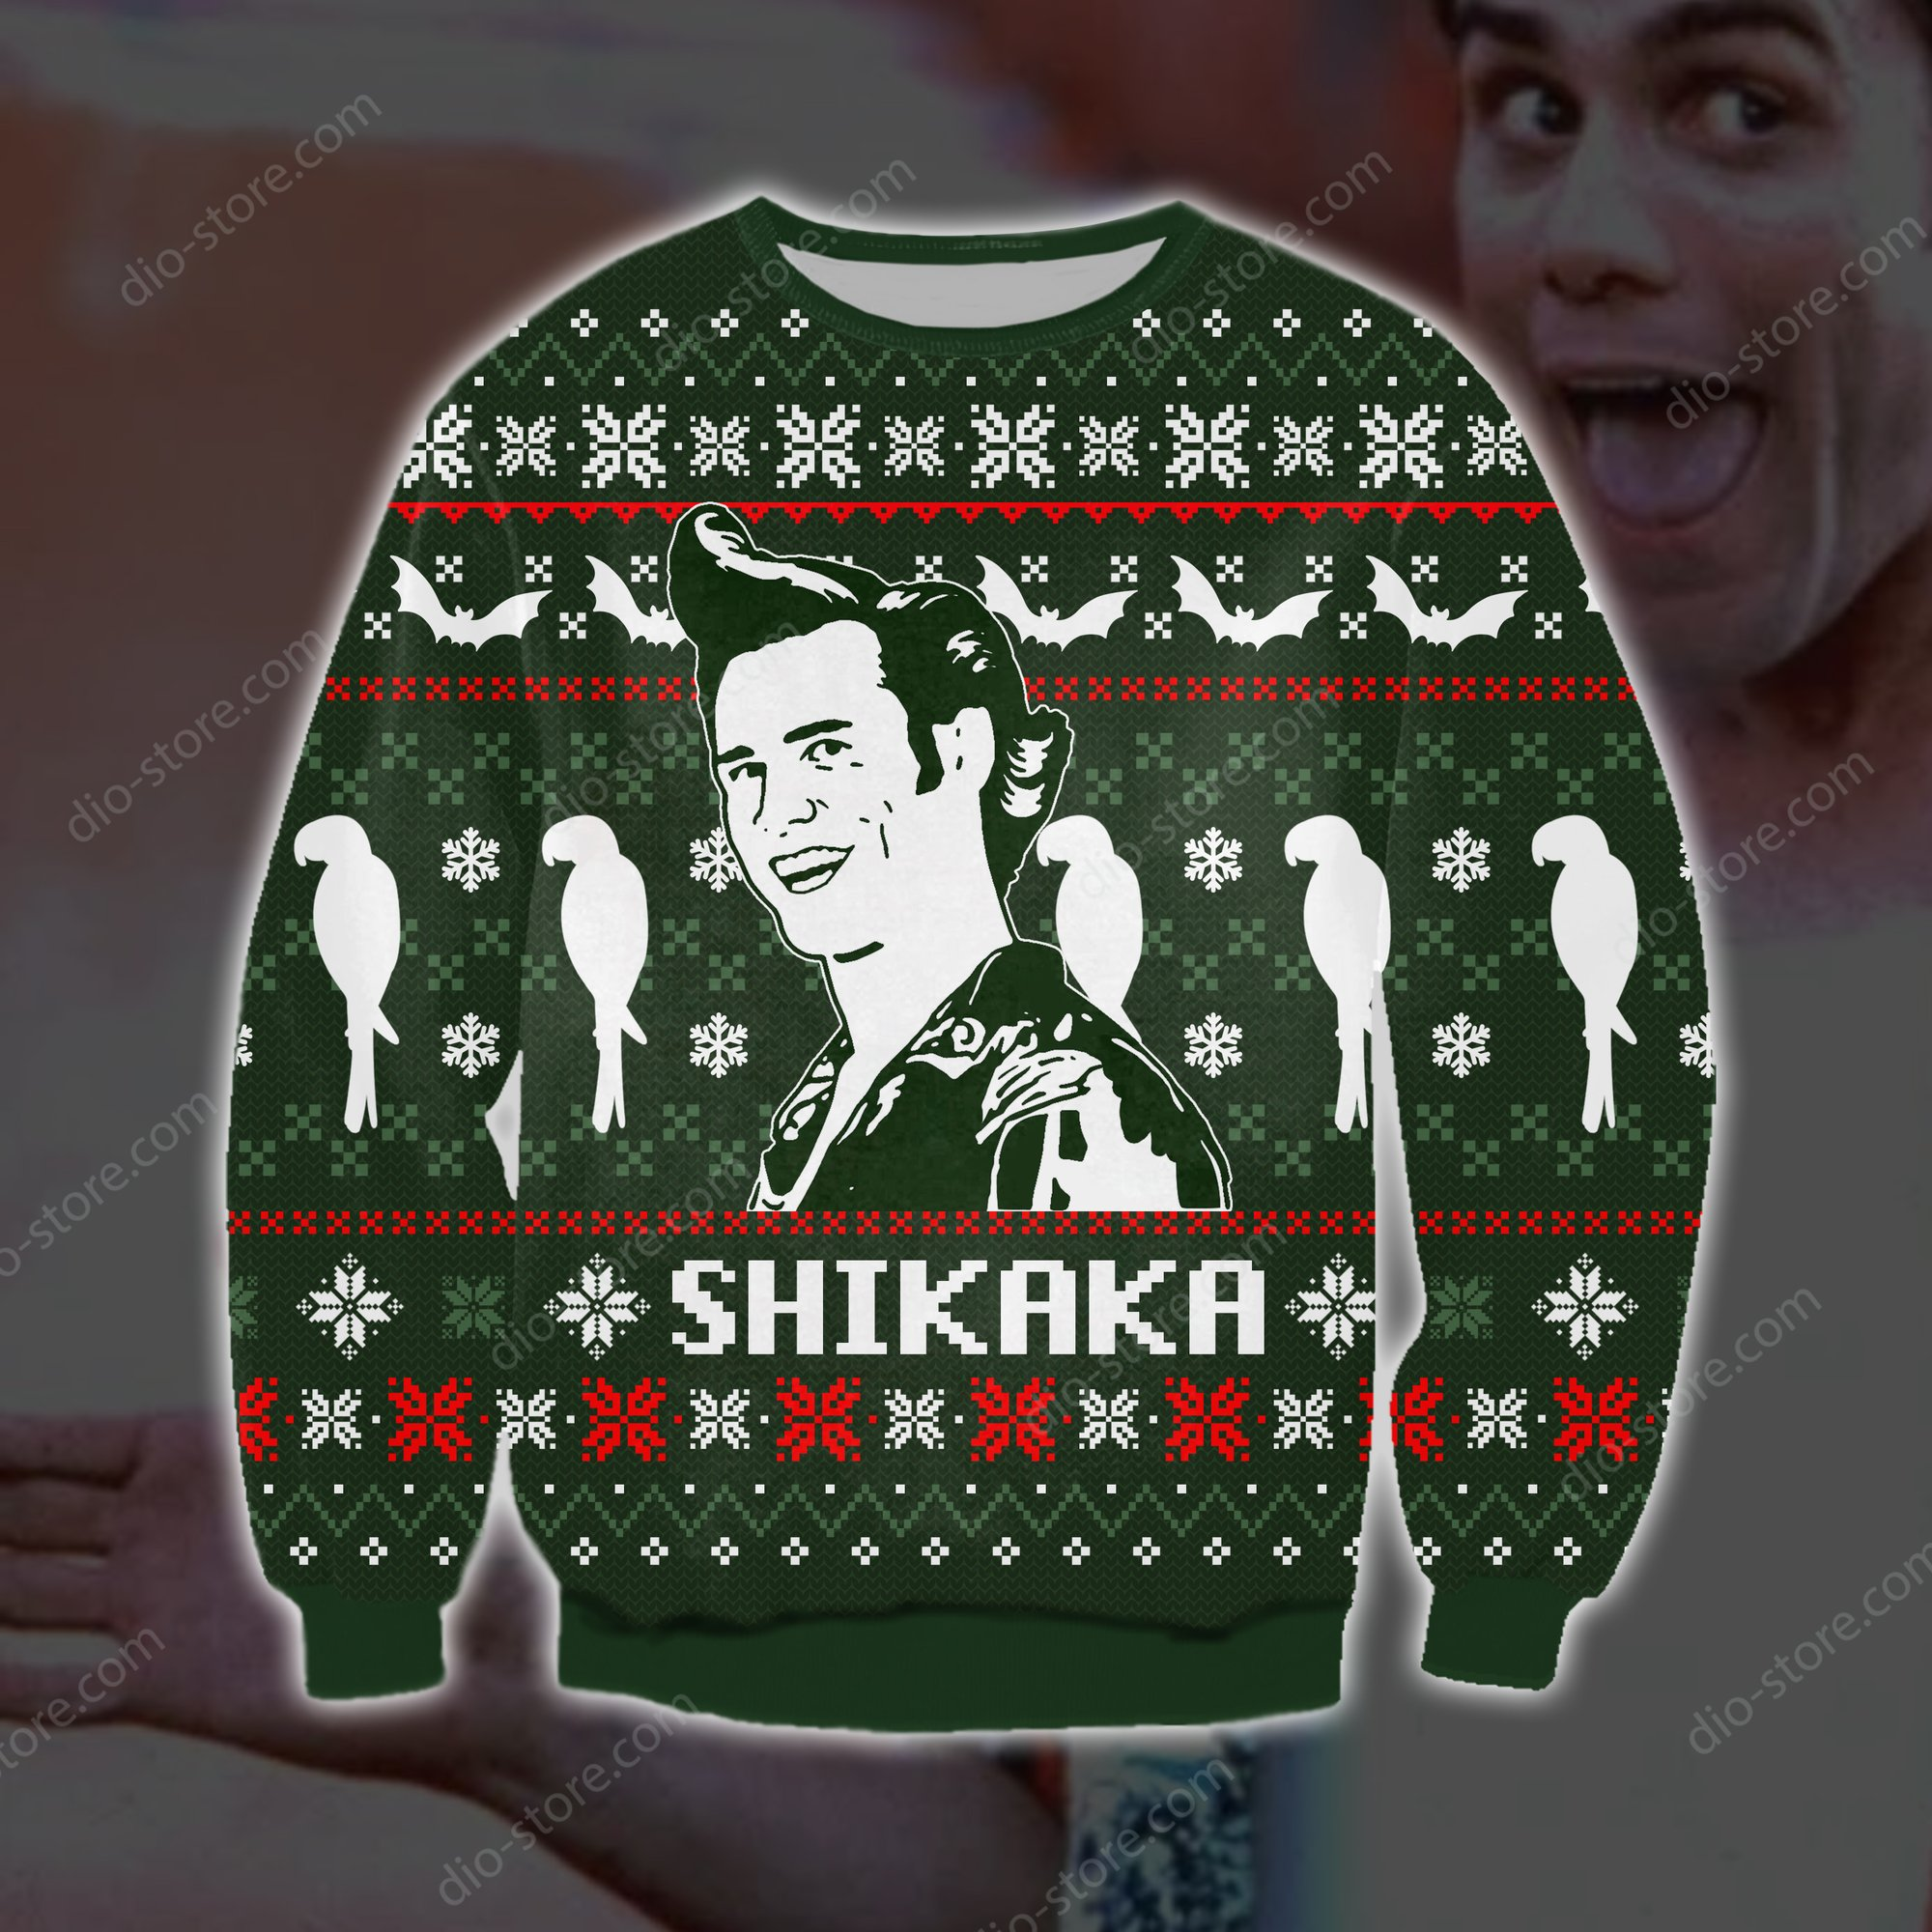 ace ventura shikaka all over printed ugly christmas sweater 2 - Copy (2)